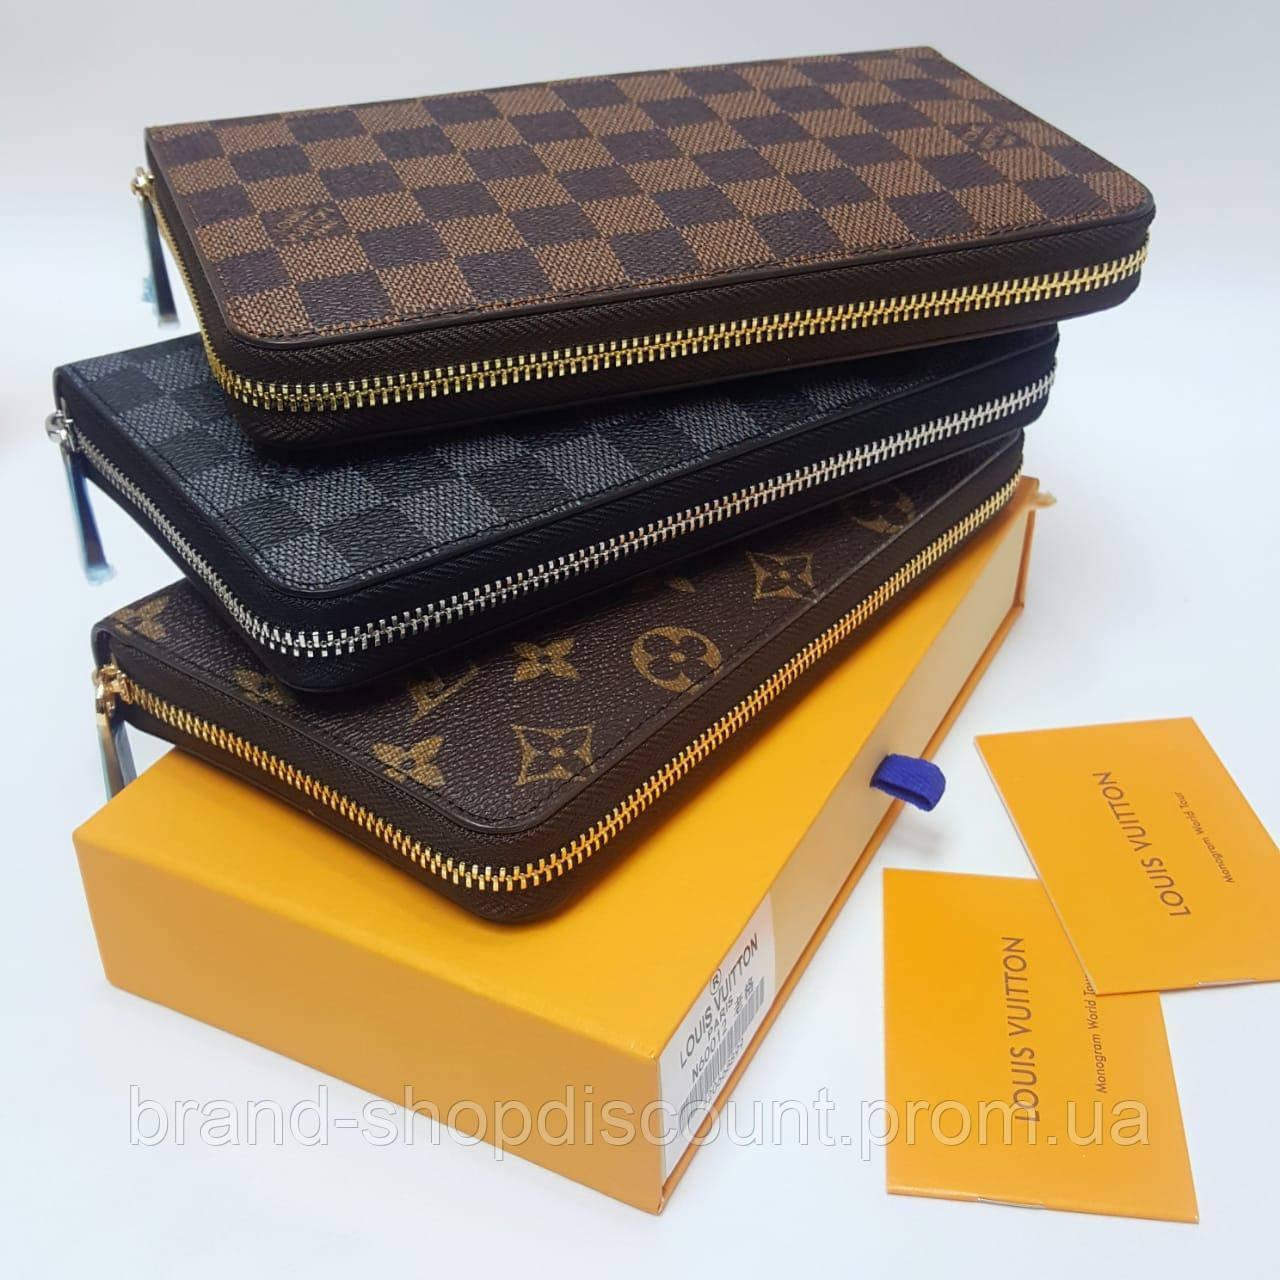 3bd12f4596ae Фирменный кошелек Louis Vuitton LV : продажа, цена в Днепре. женские ...